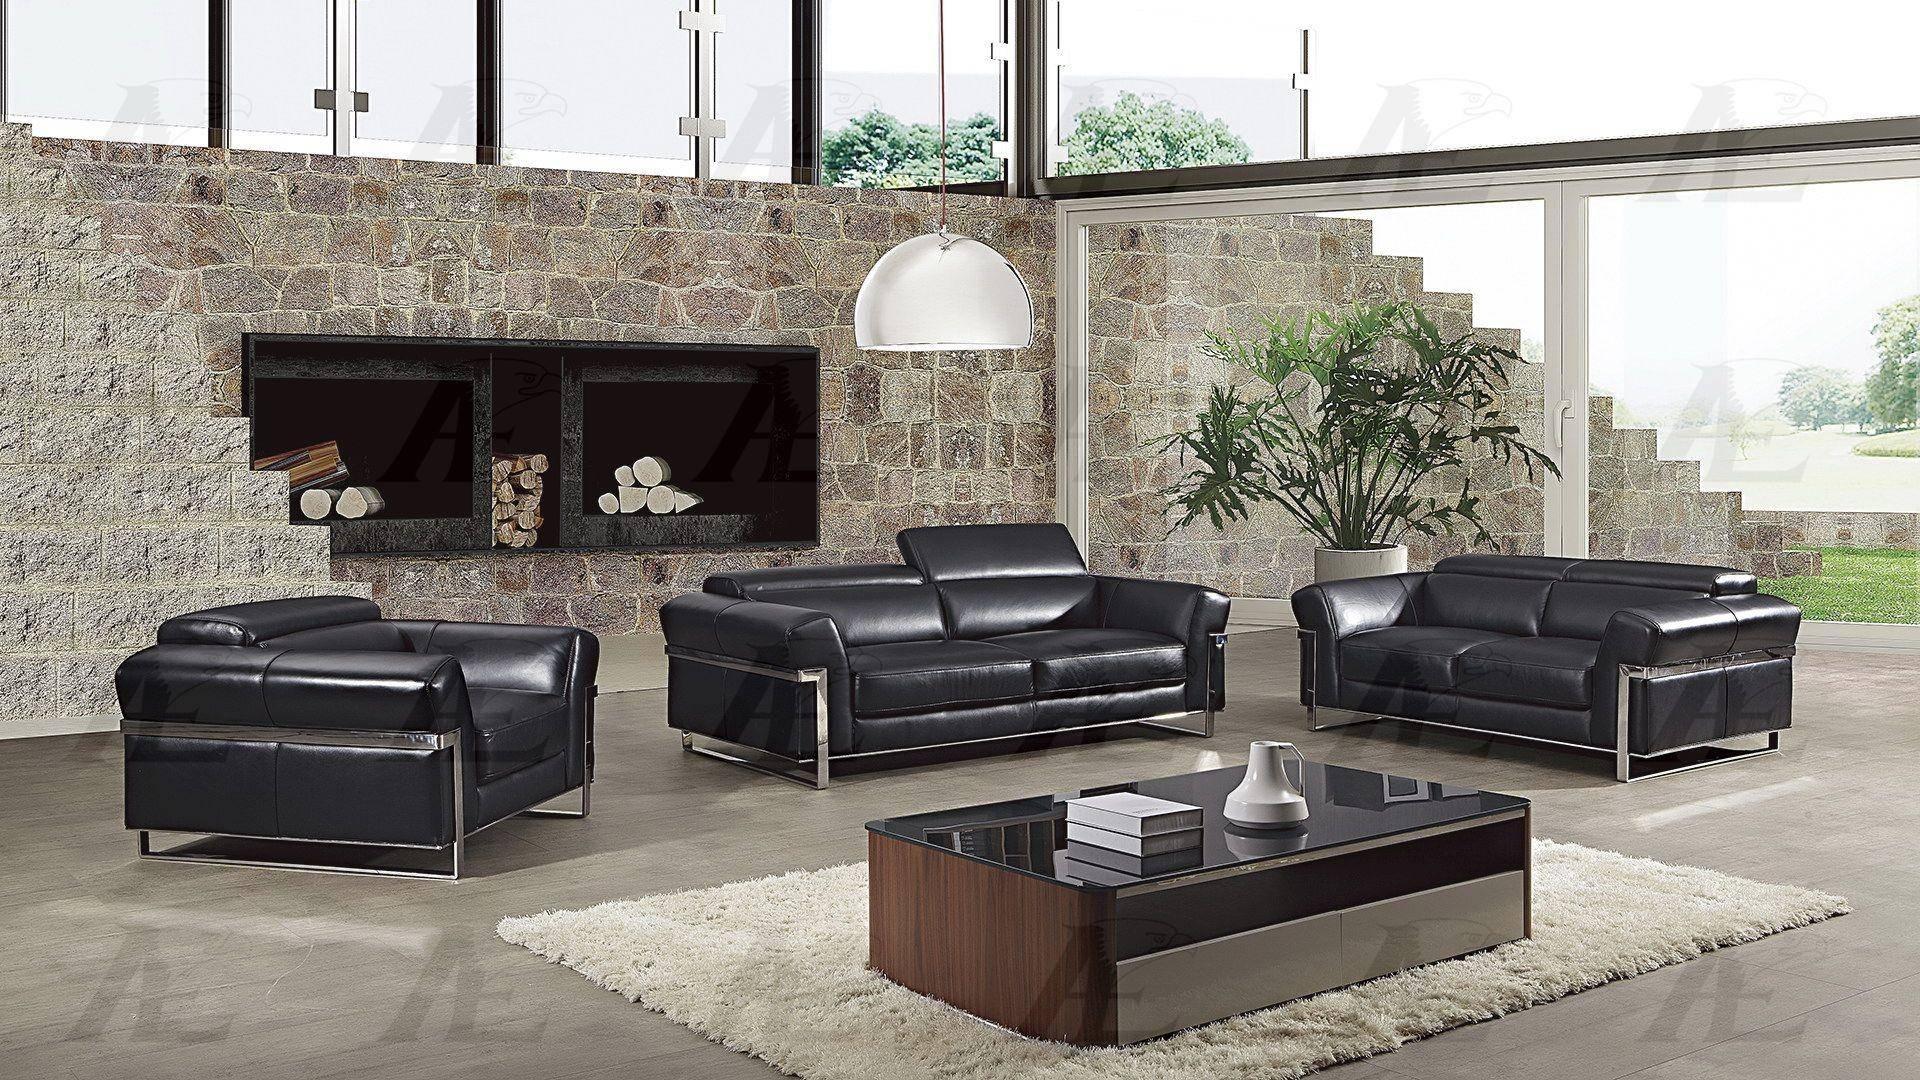 American Eagle EK012-BK Sofa Loveseat and Chair Set 3 Pcs in Black, Italian  Leather